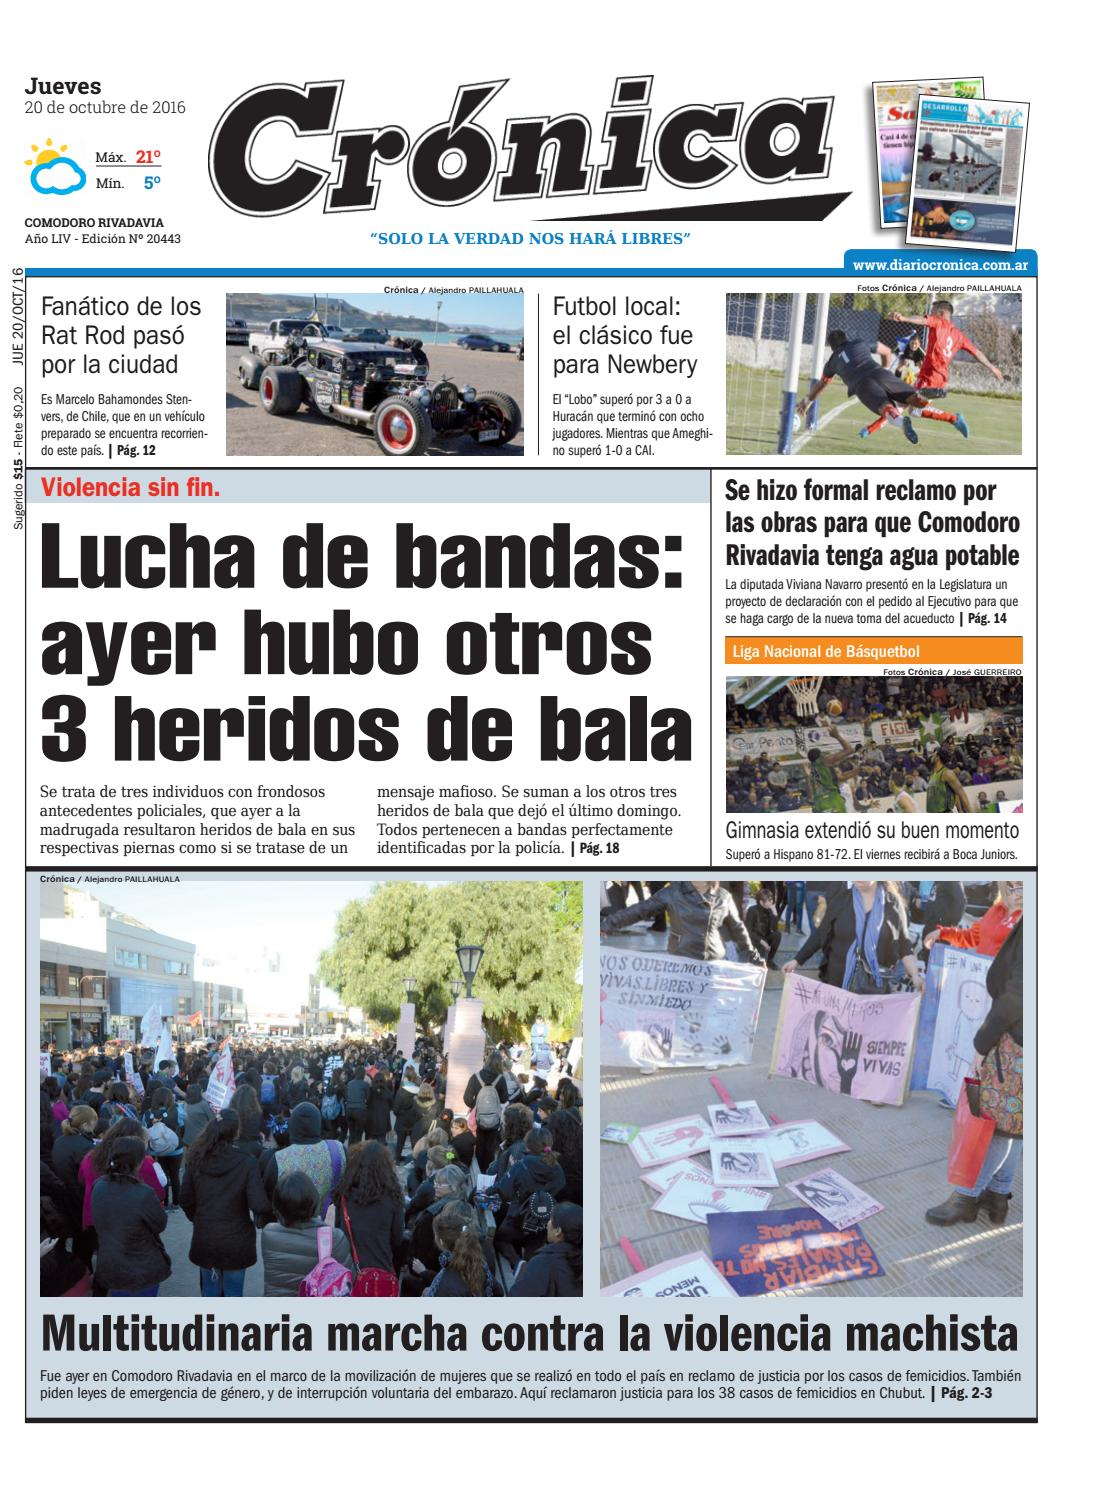 A2c7963dfba4a242441a941b35b62b4c by Diario Crónica - issuu